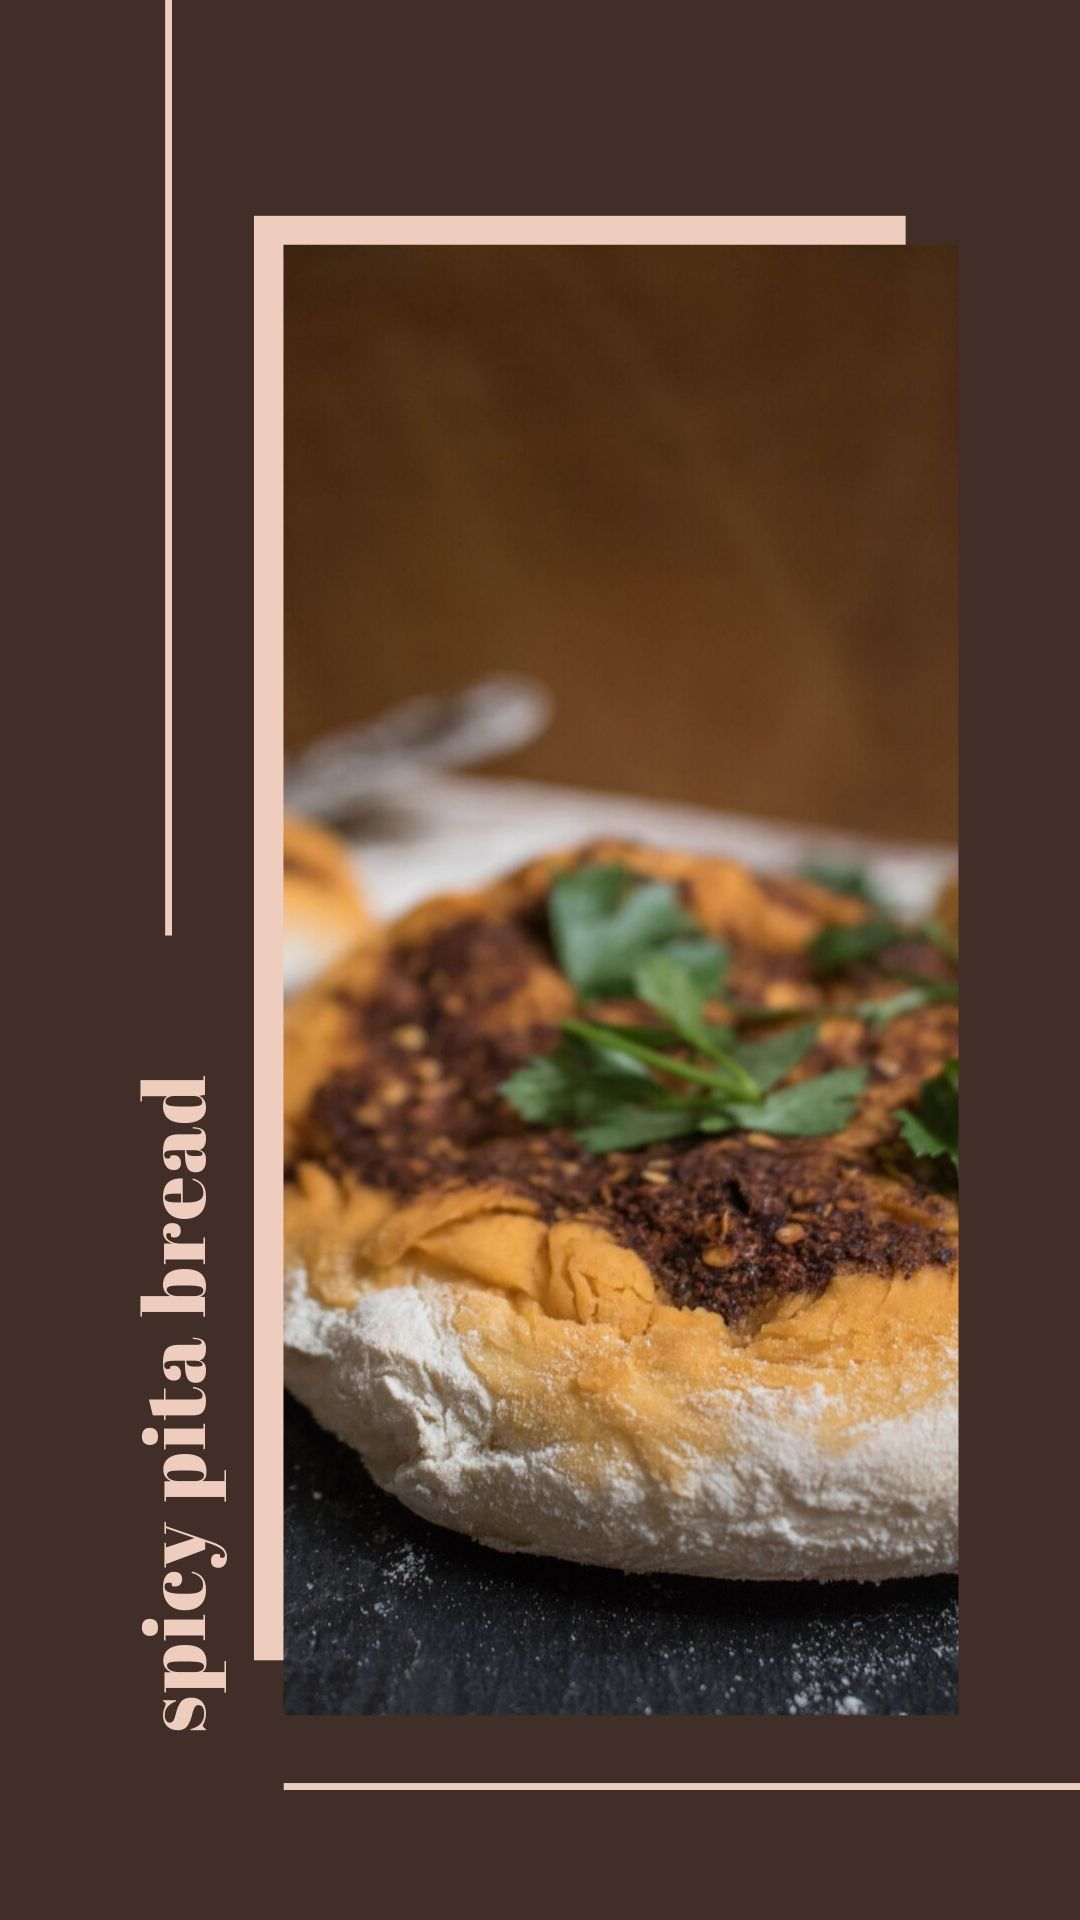 Spicy Pita Breads